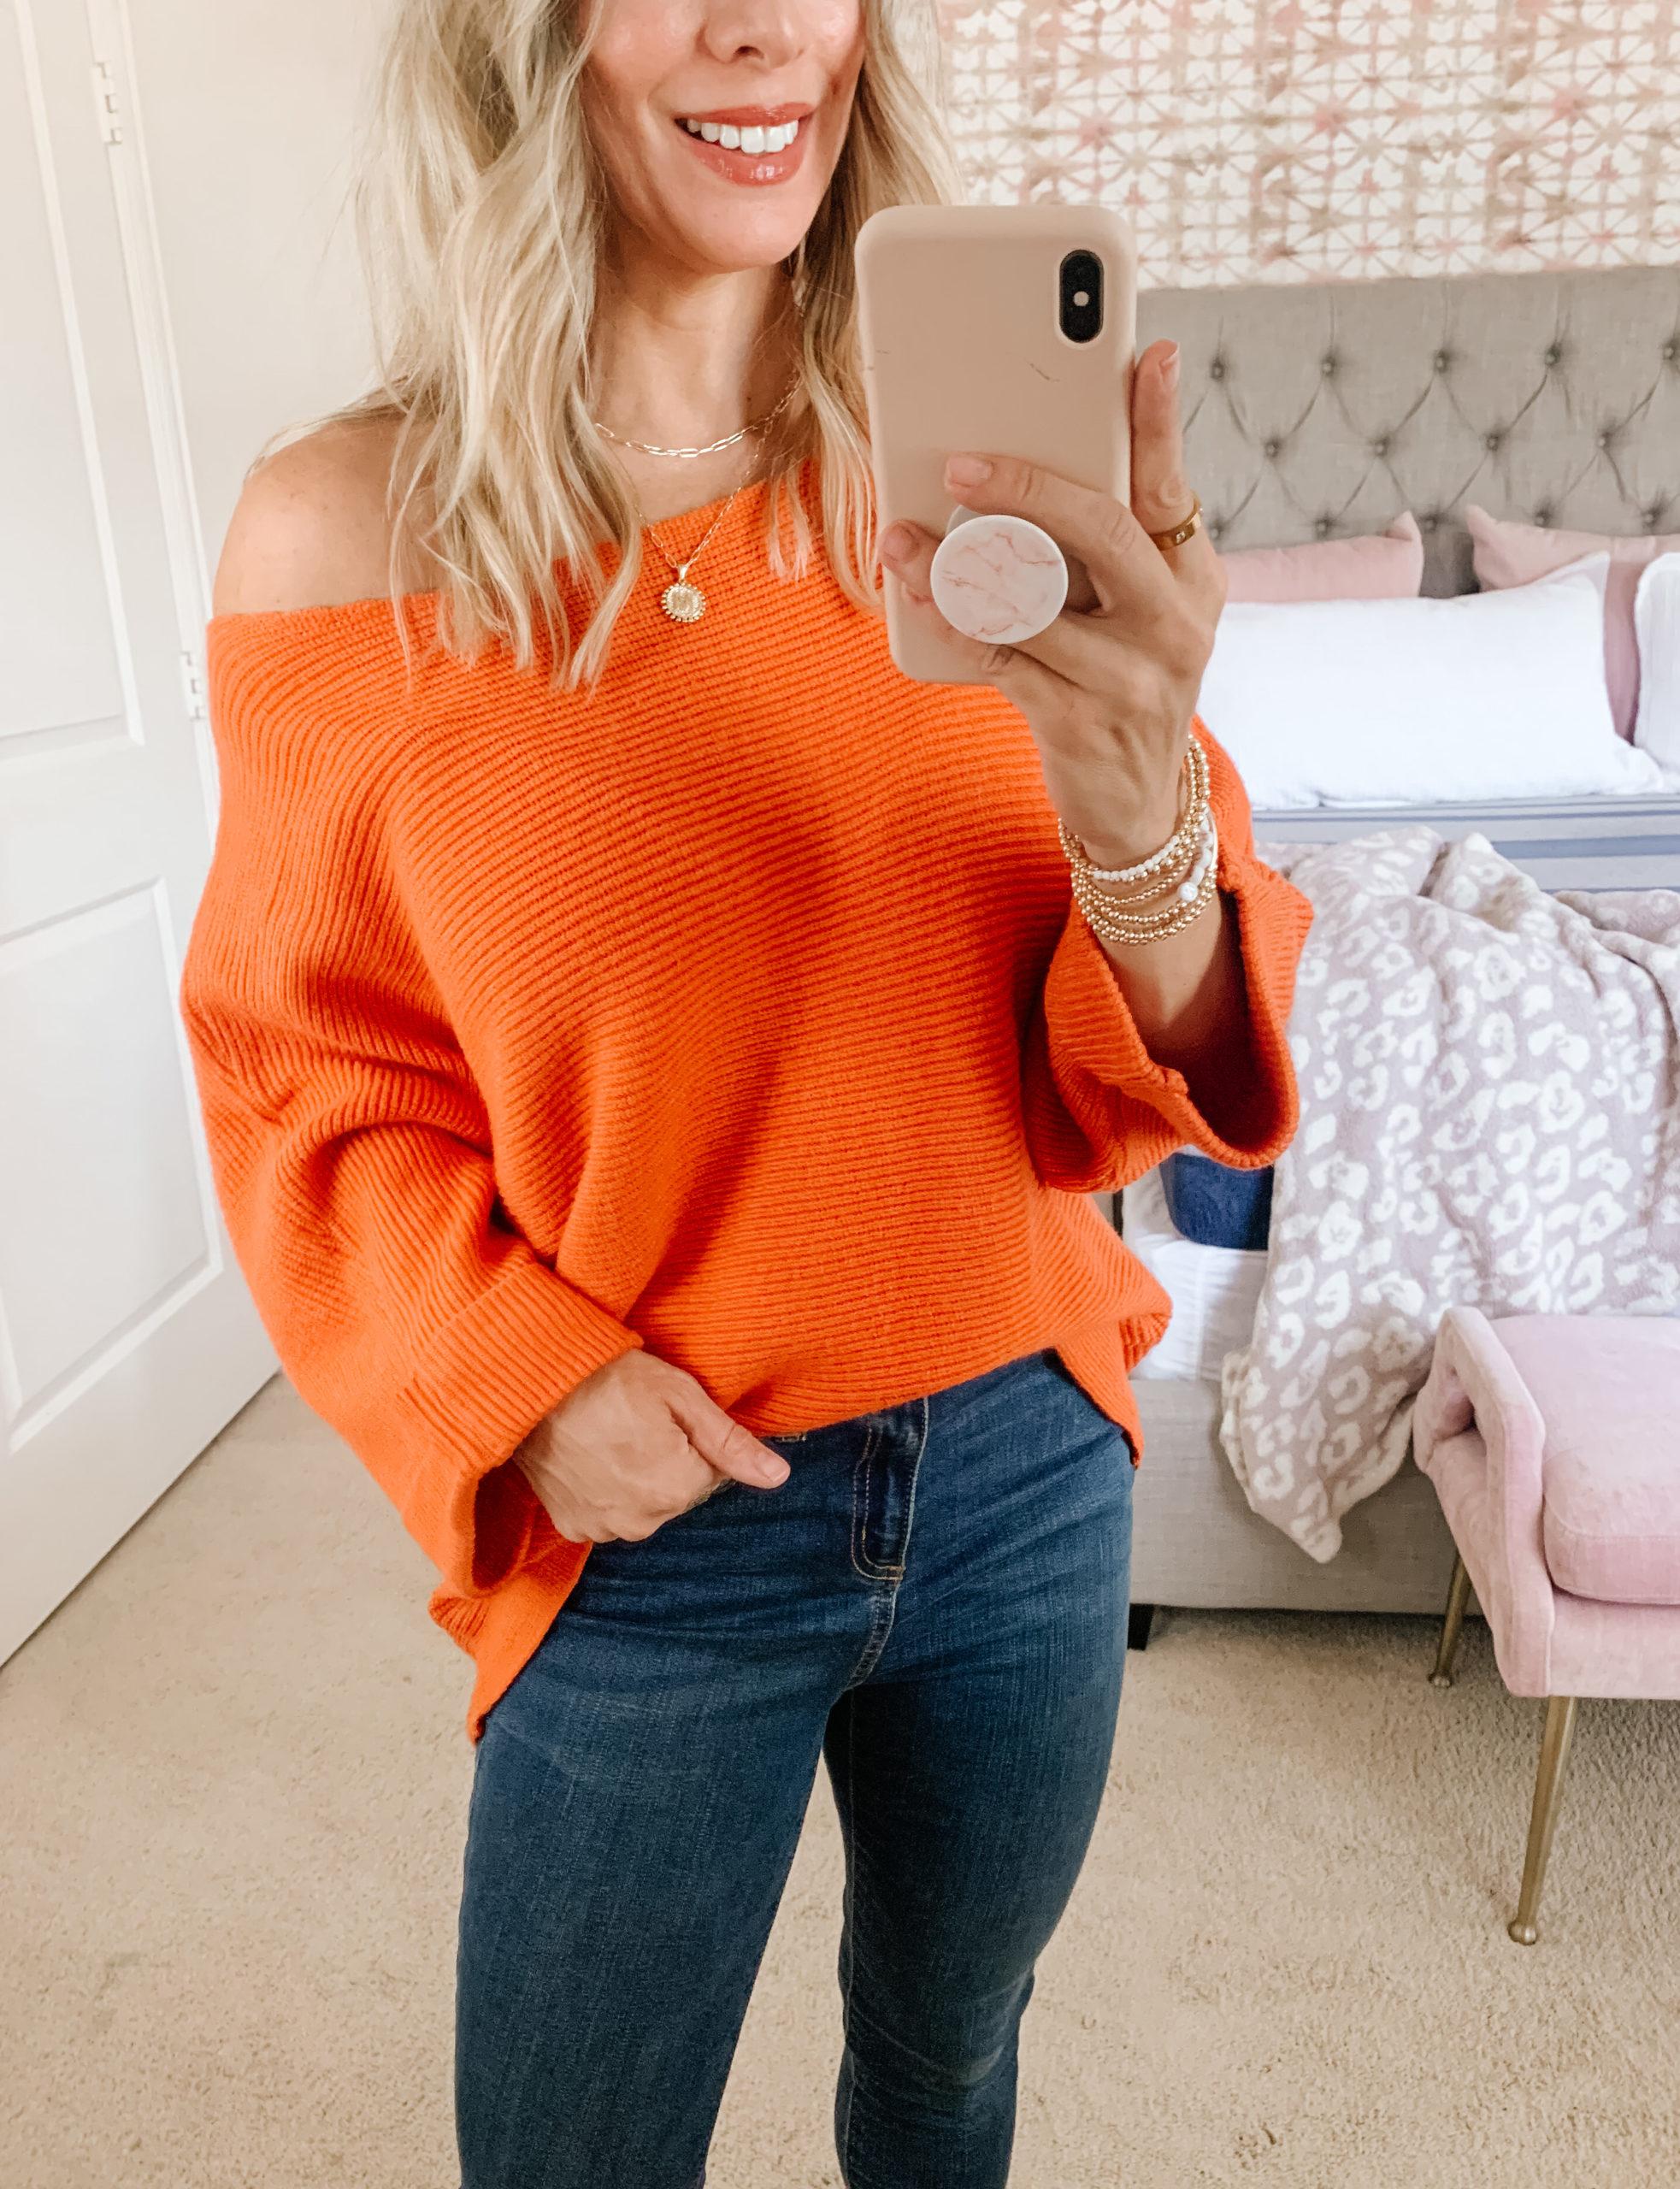 Amazon Fashion, Orange Sweater, Jeans, Booties